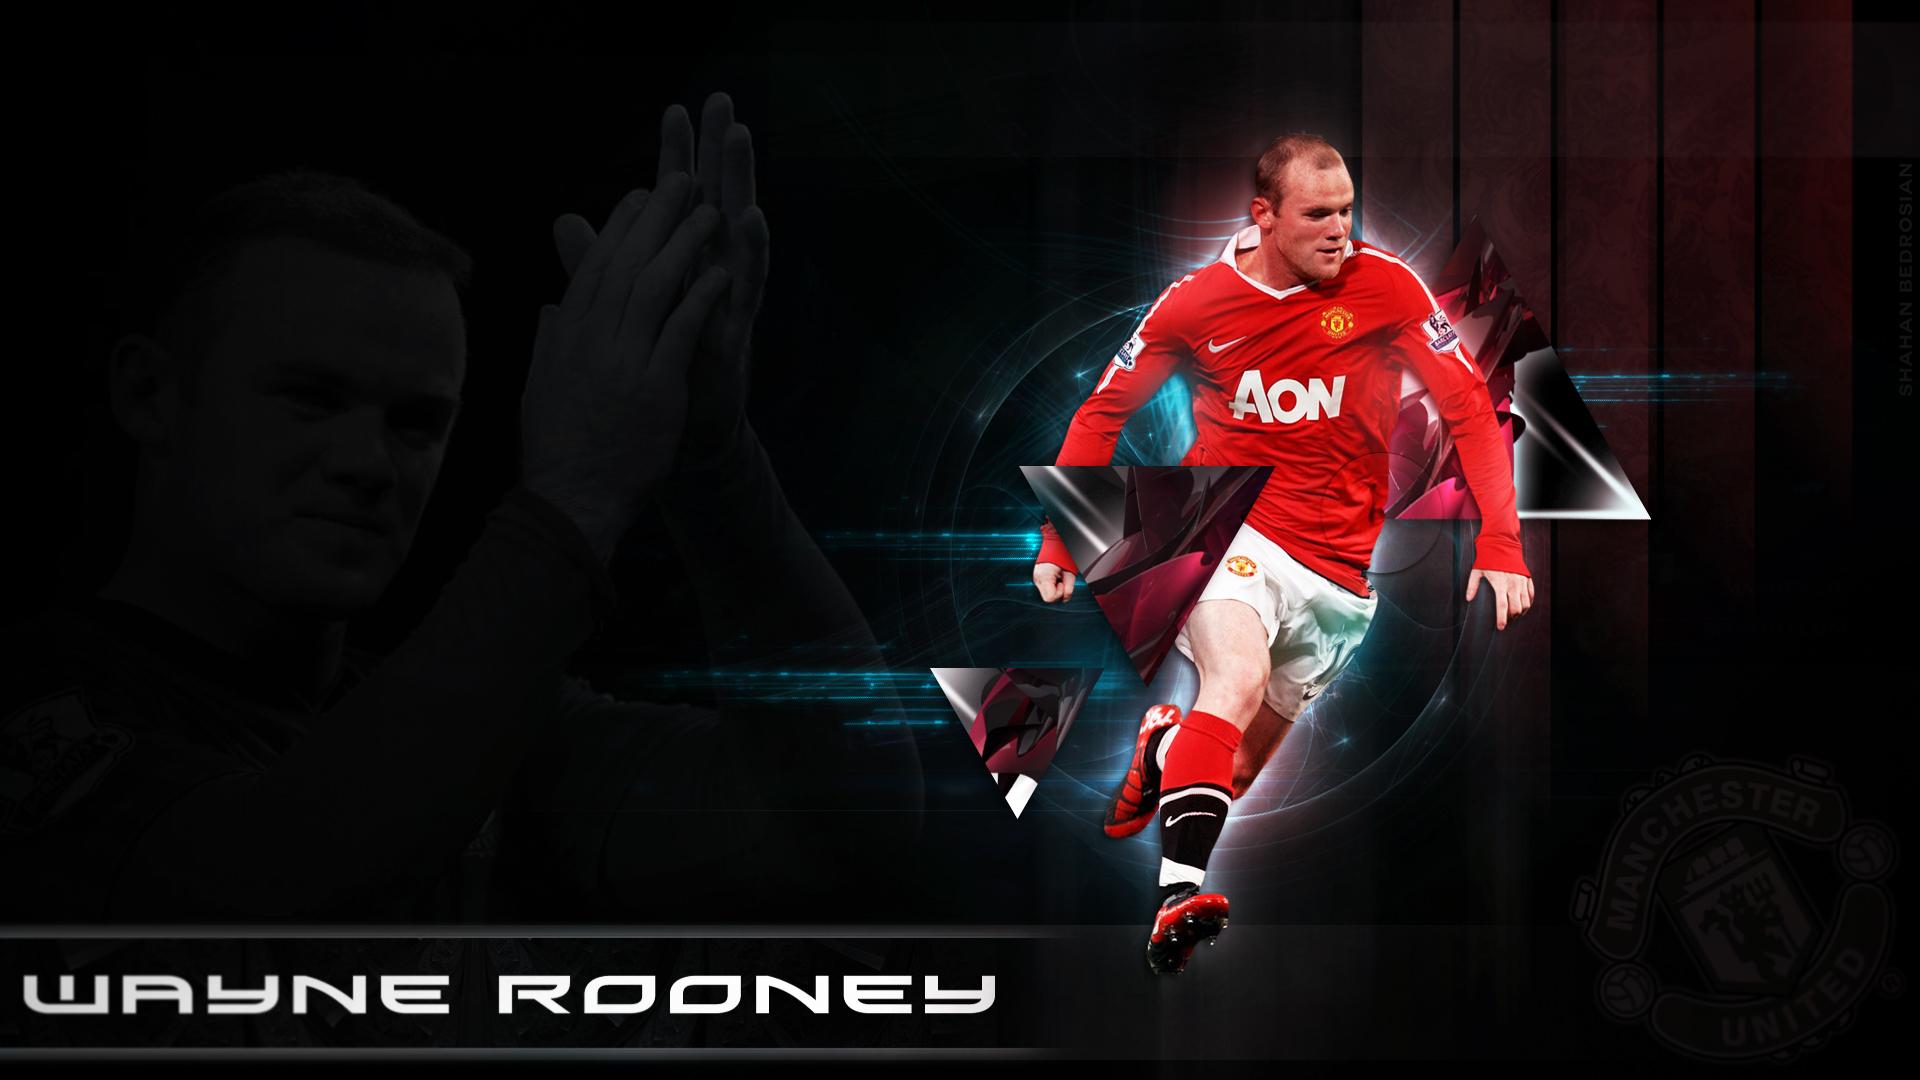 Wayne Rooney Legend